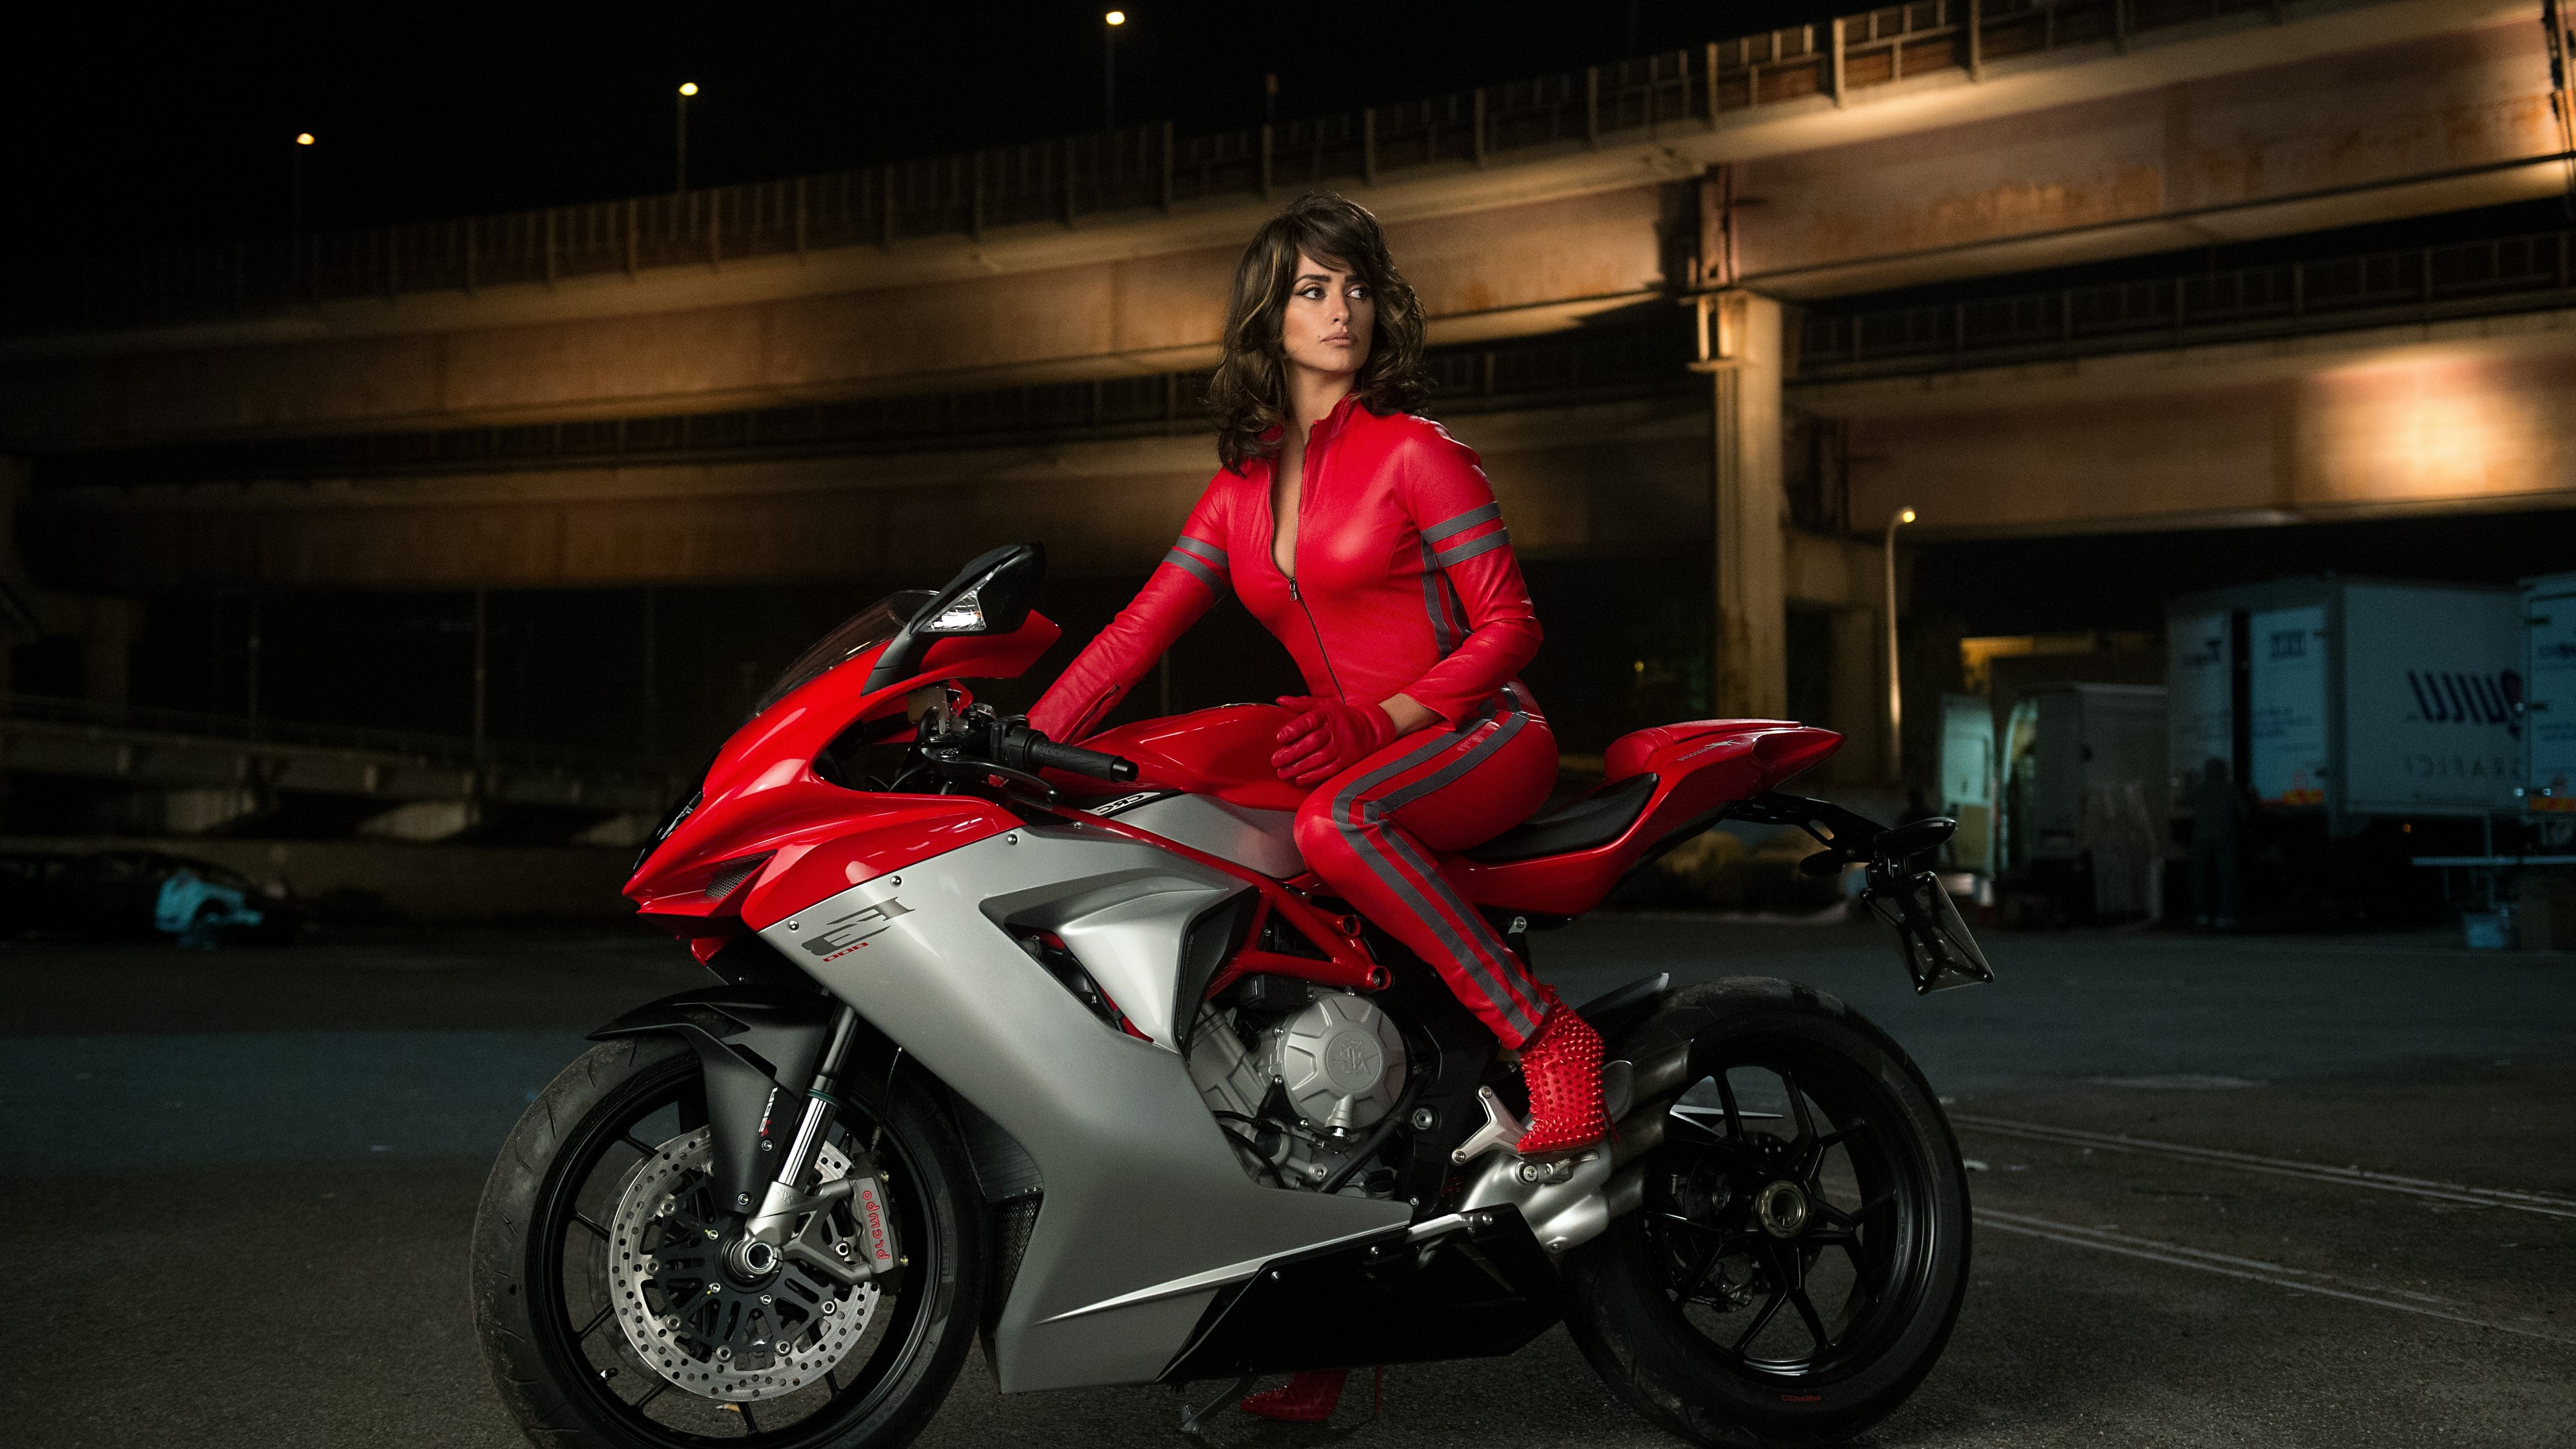 penelope cruz on bike 1536856707 - Penelope Cruz On Bike - zoolander 2 wallpapers, penelope cruz wallpapers, movies wallpapers, girls wallpapers, celebrities wallpapers, 2016 movies wallpapers